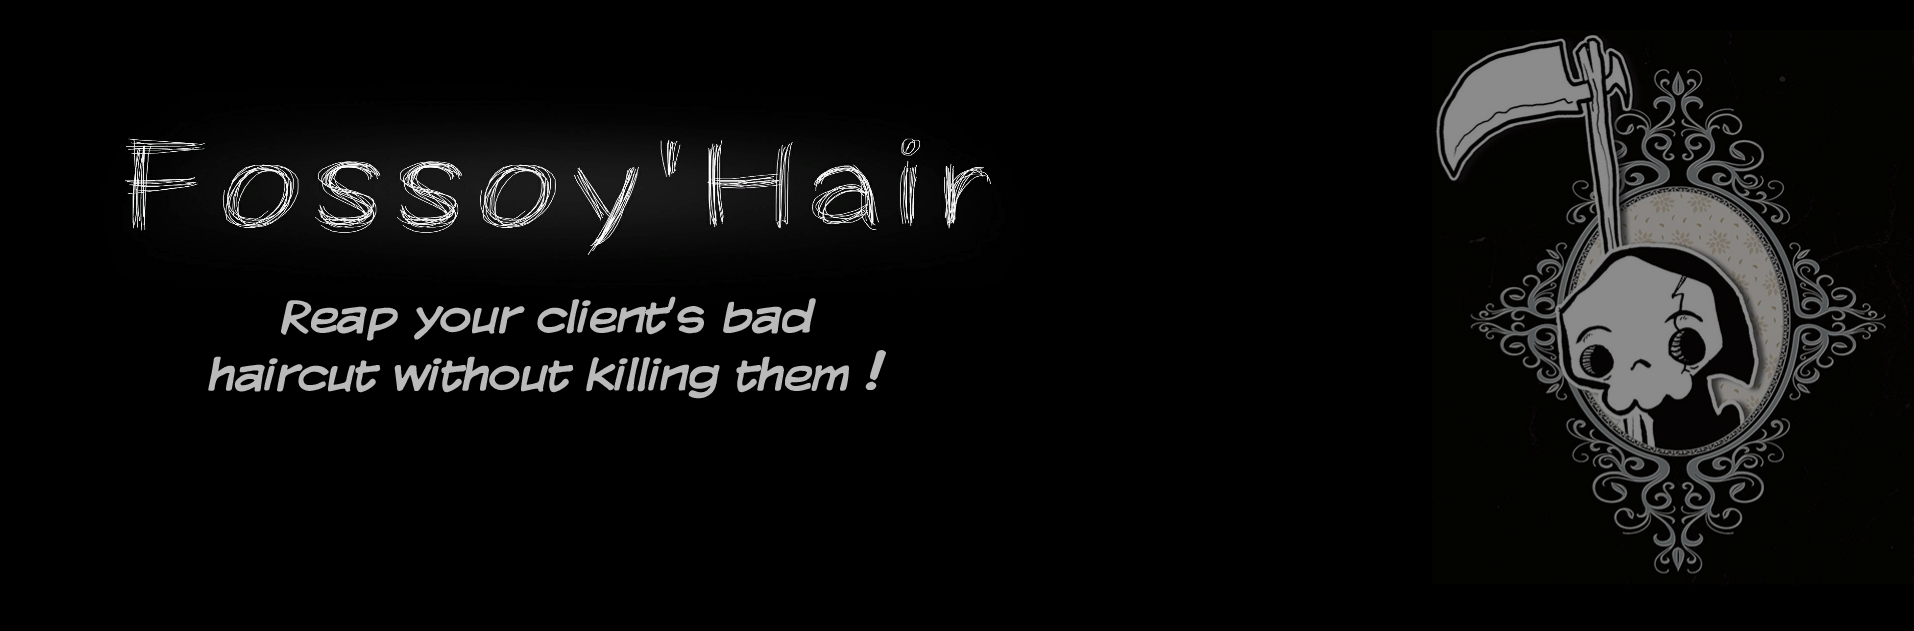 Fossoy'HAIR